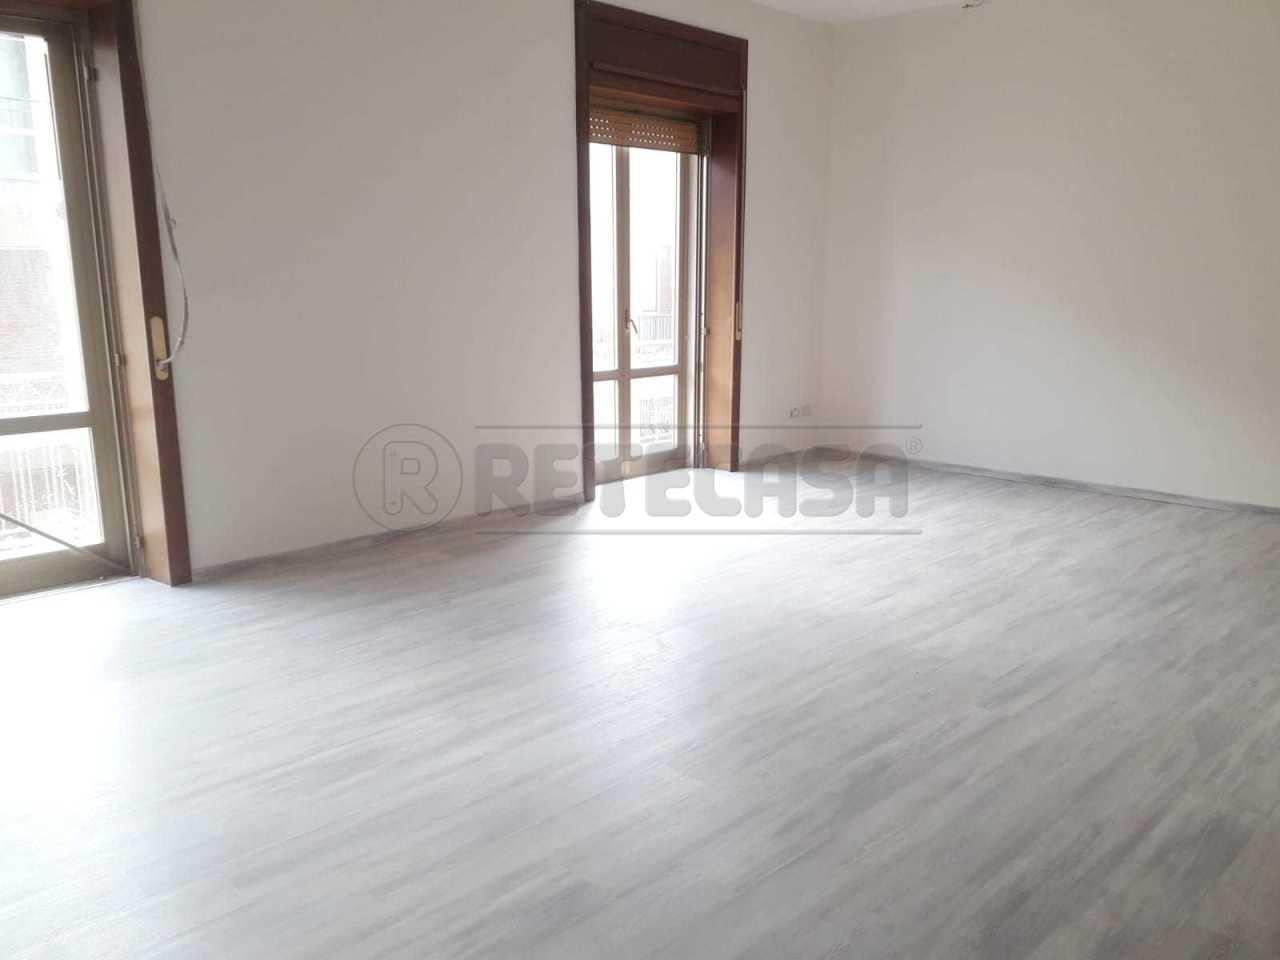 Appartamento a centro, Mercato San Severino